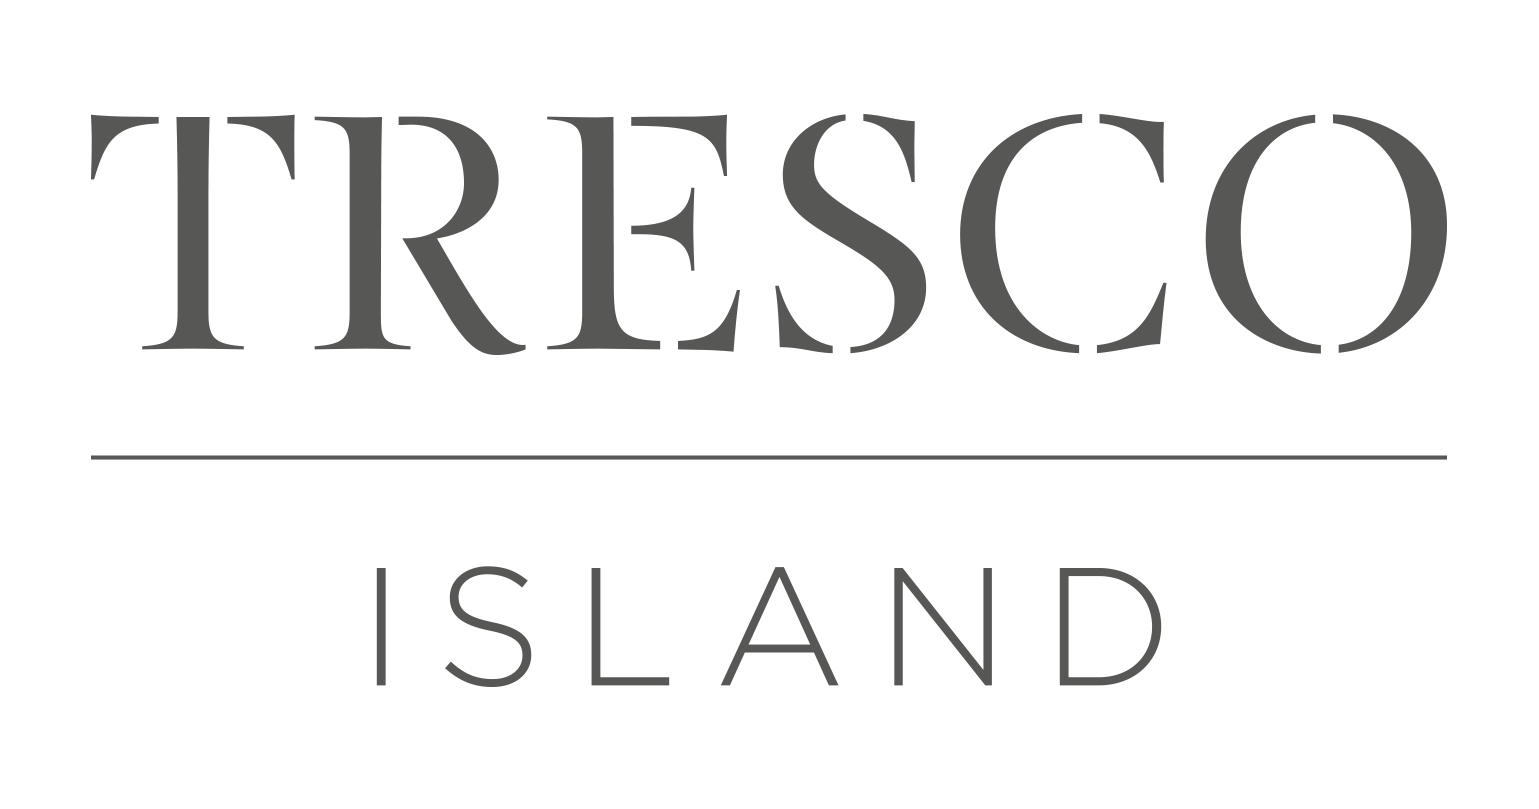 Tresco-Island_Logo.png